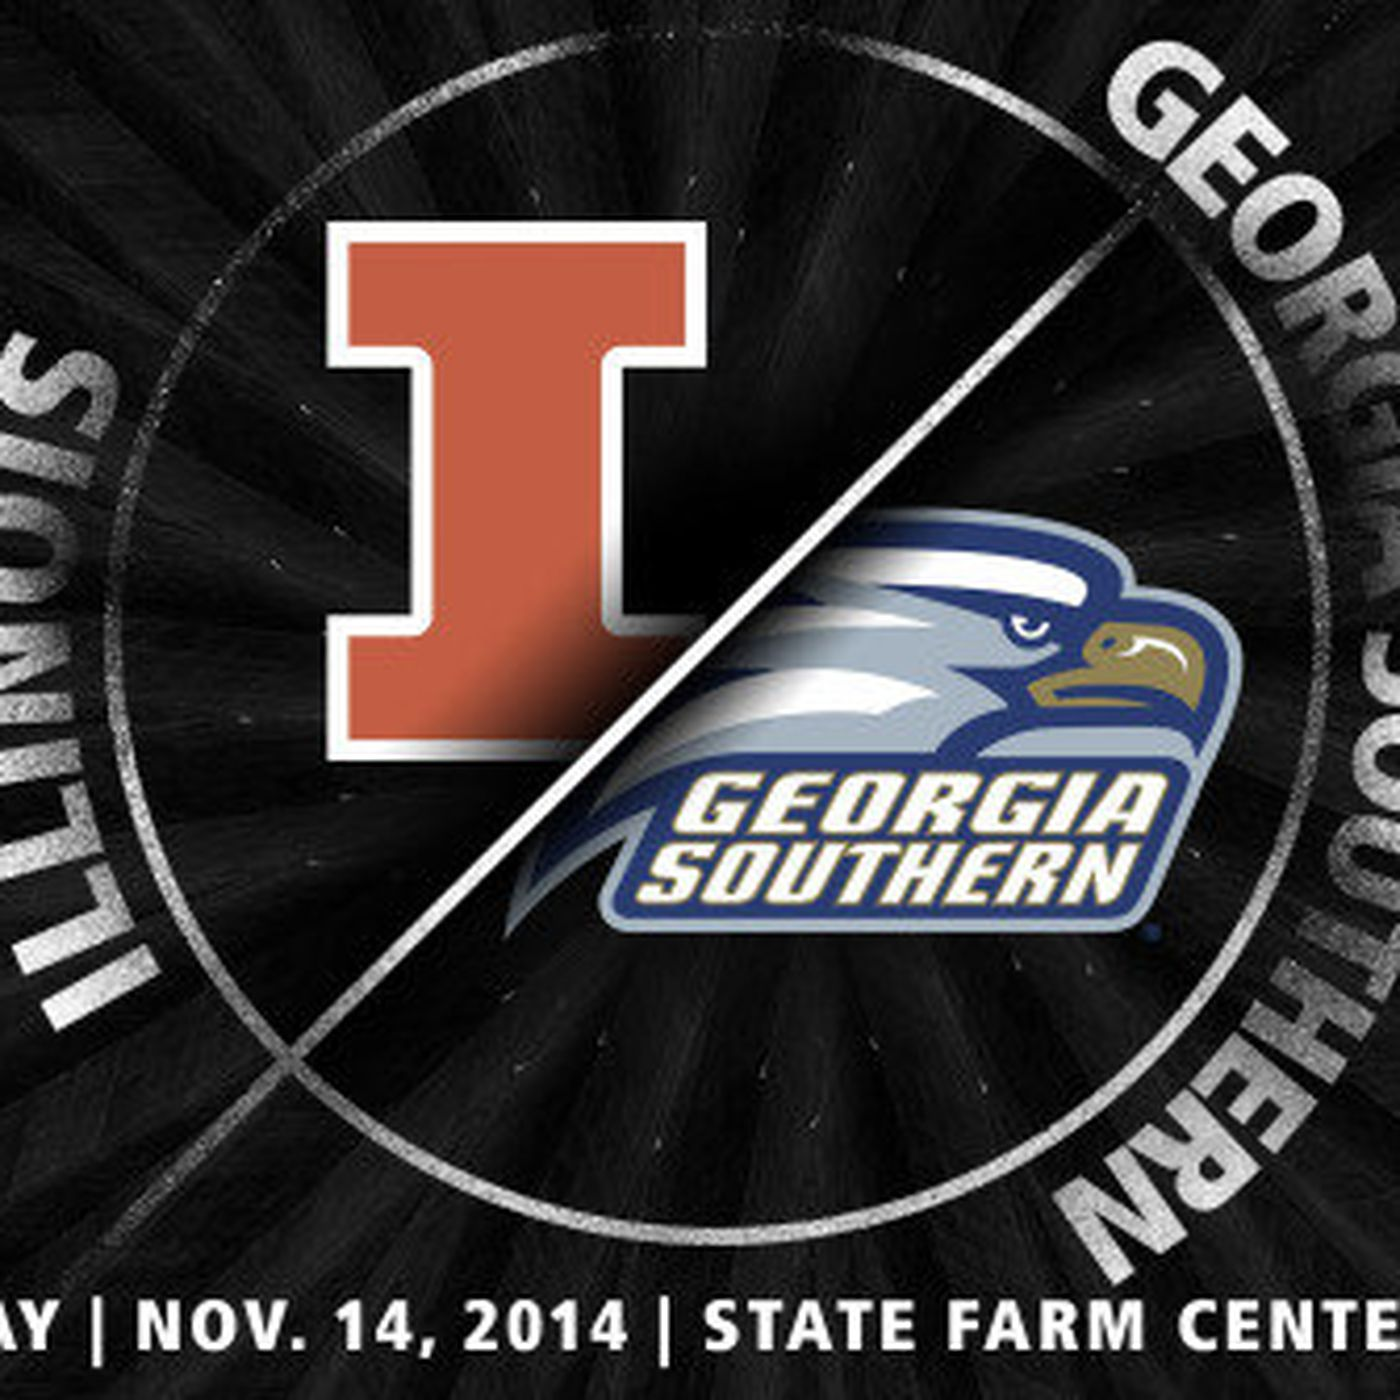 Game Thread: Illinois vs Georgia Southern - The Champaign Room